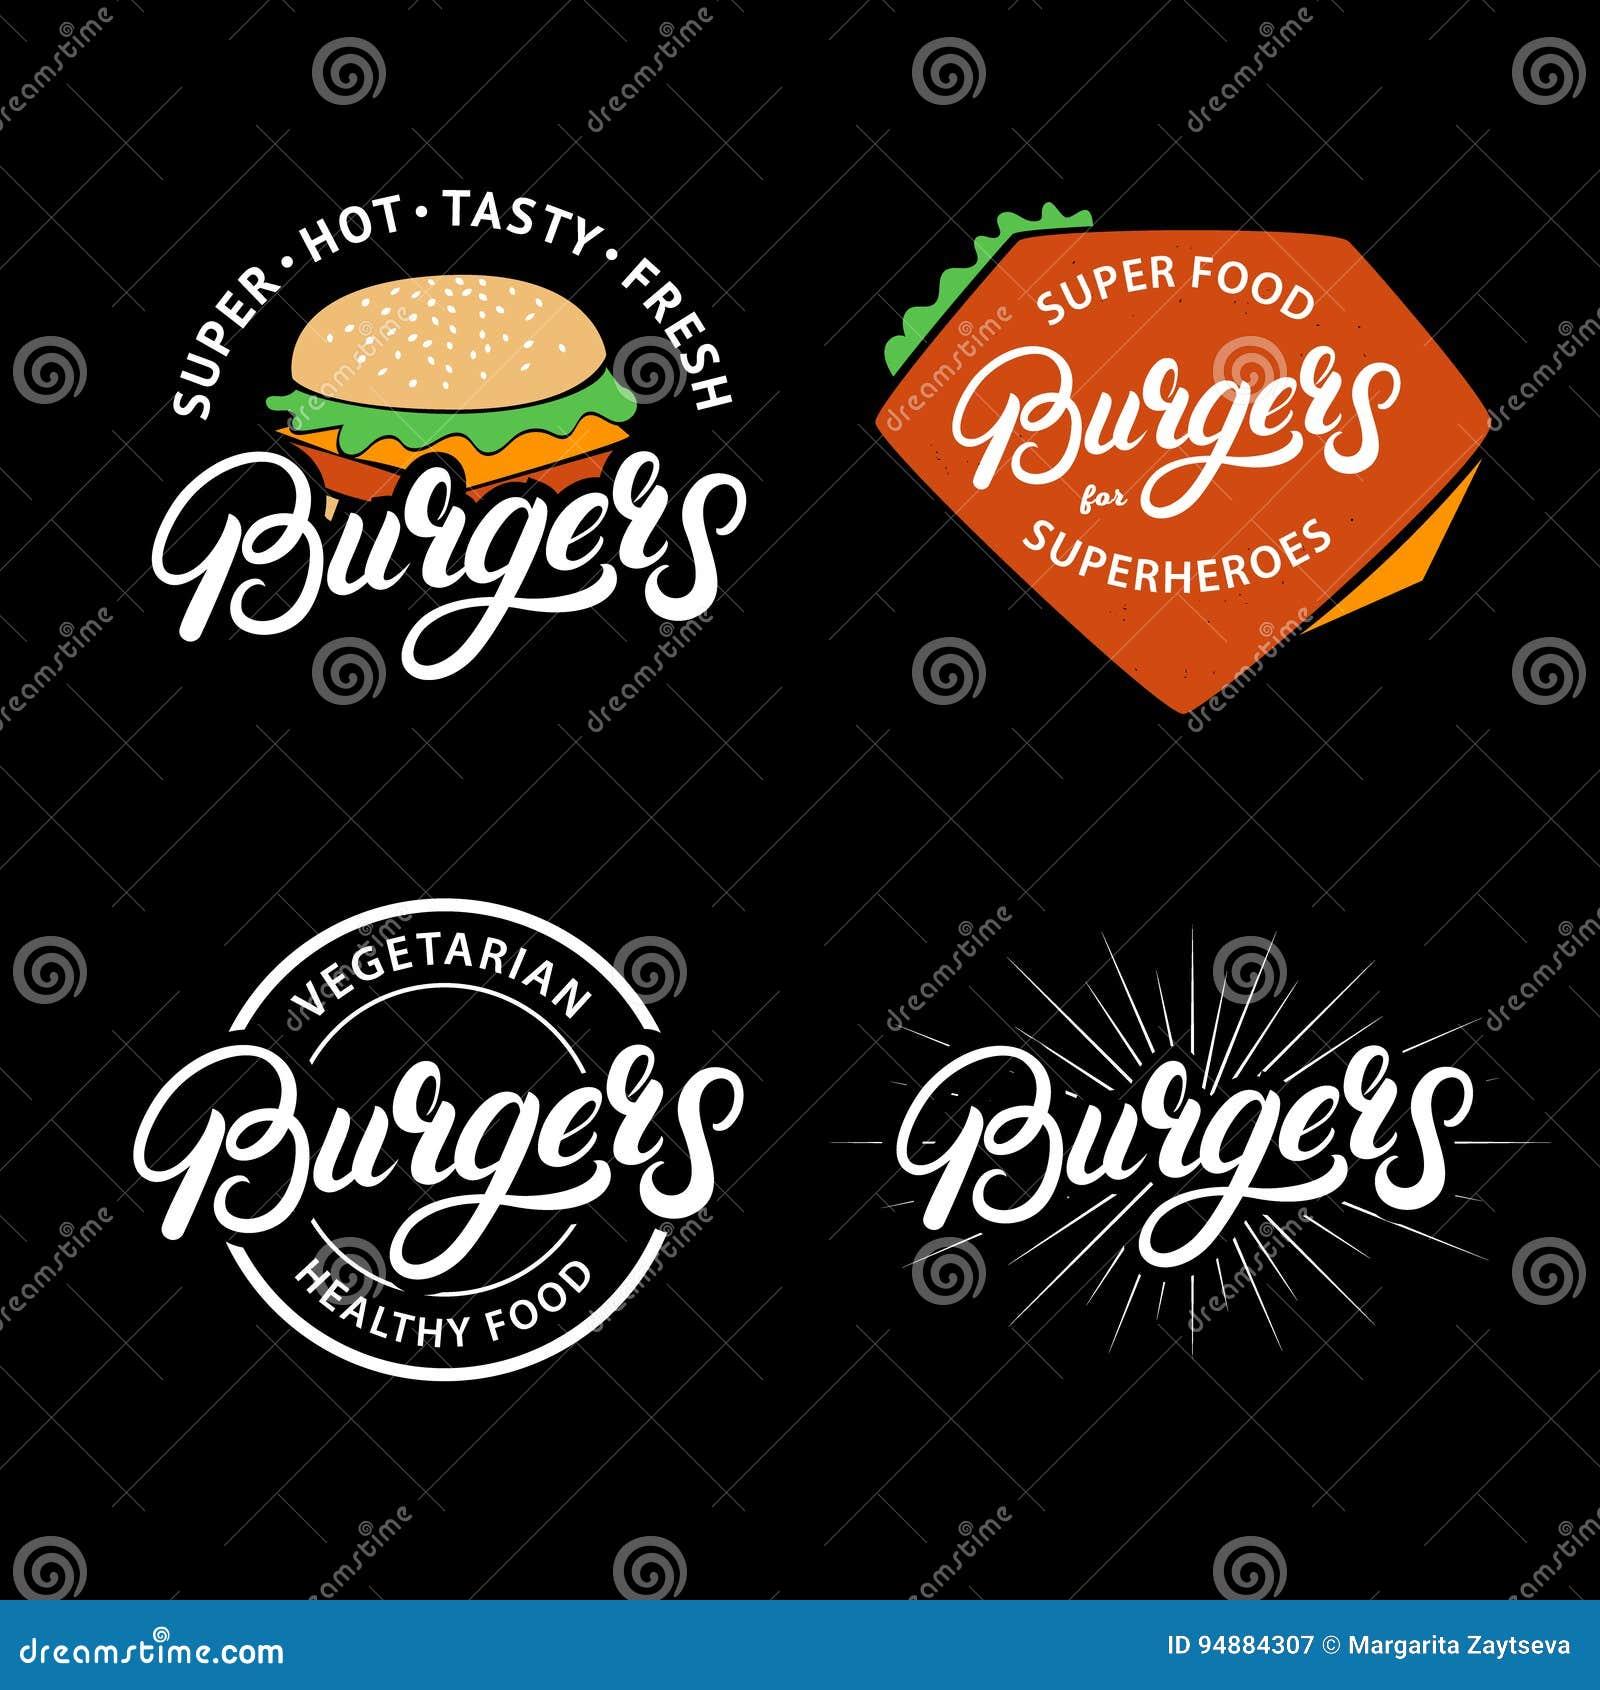 Burgers Cartoons, Illustrations & Vector Stock Images